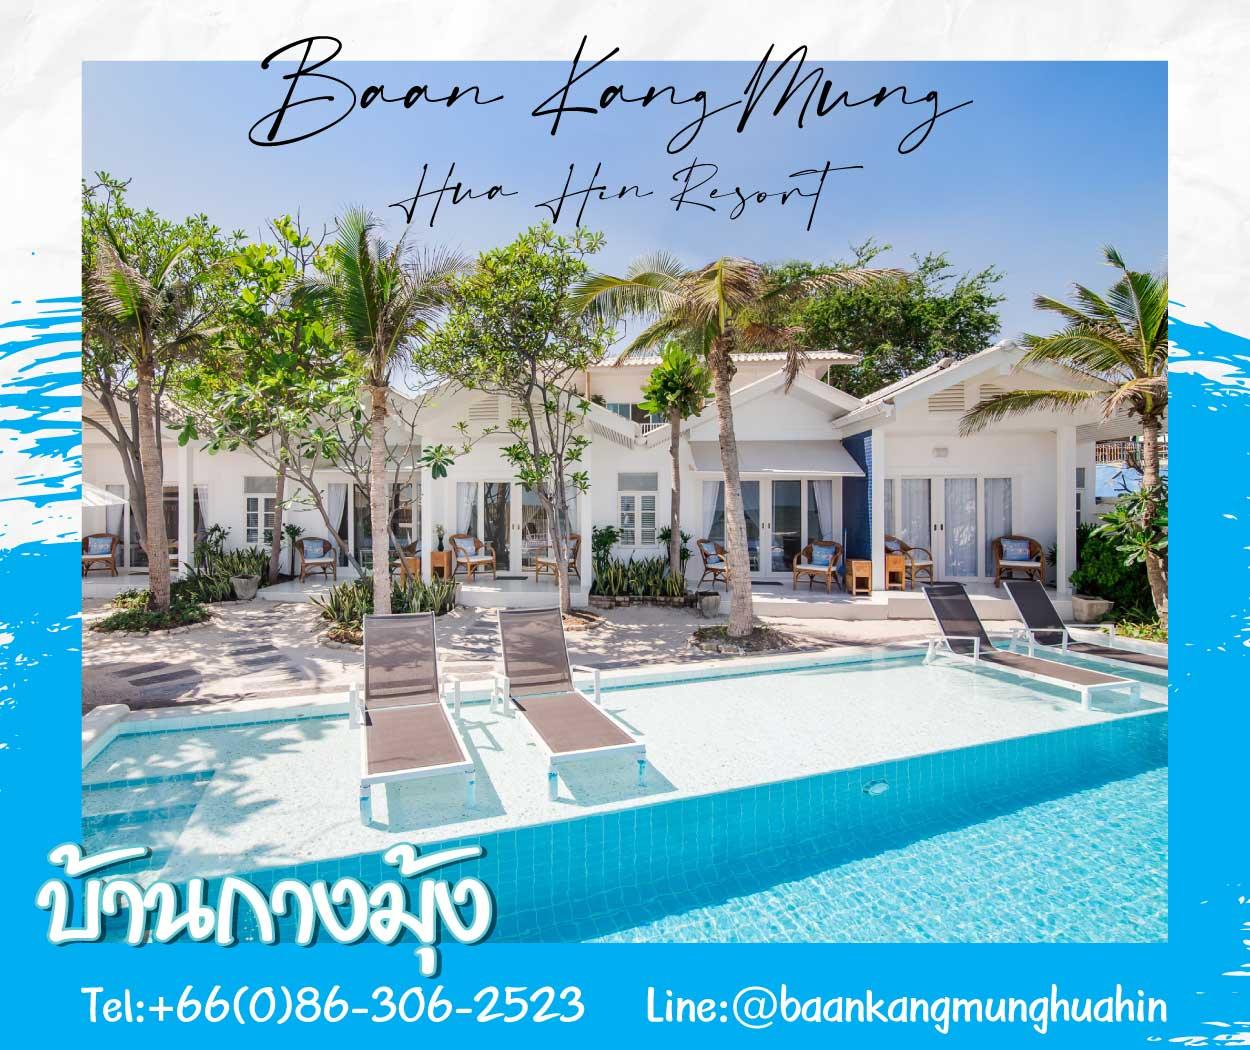 Baan Kangmung Hua Hin Resort